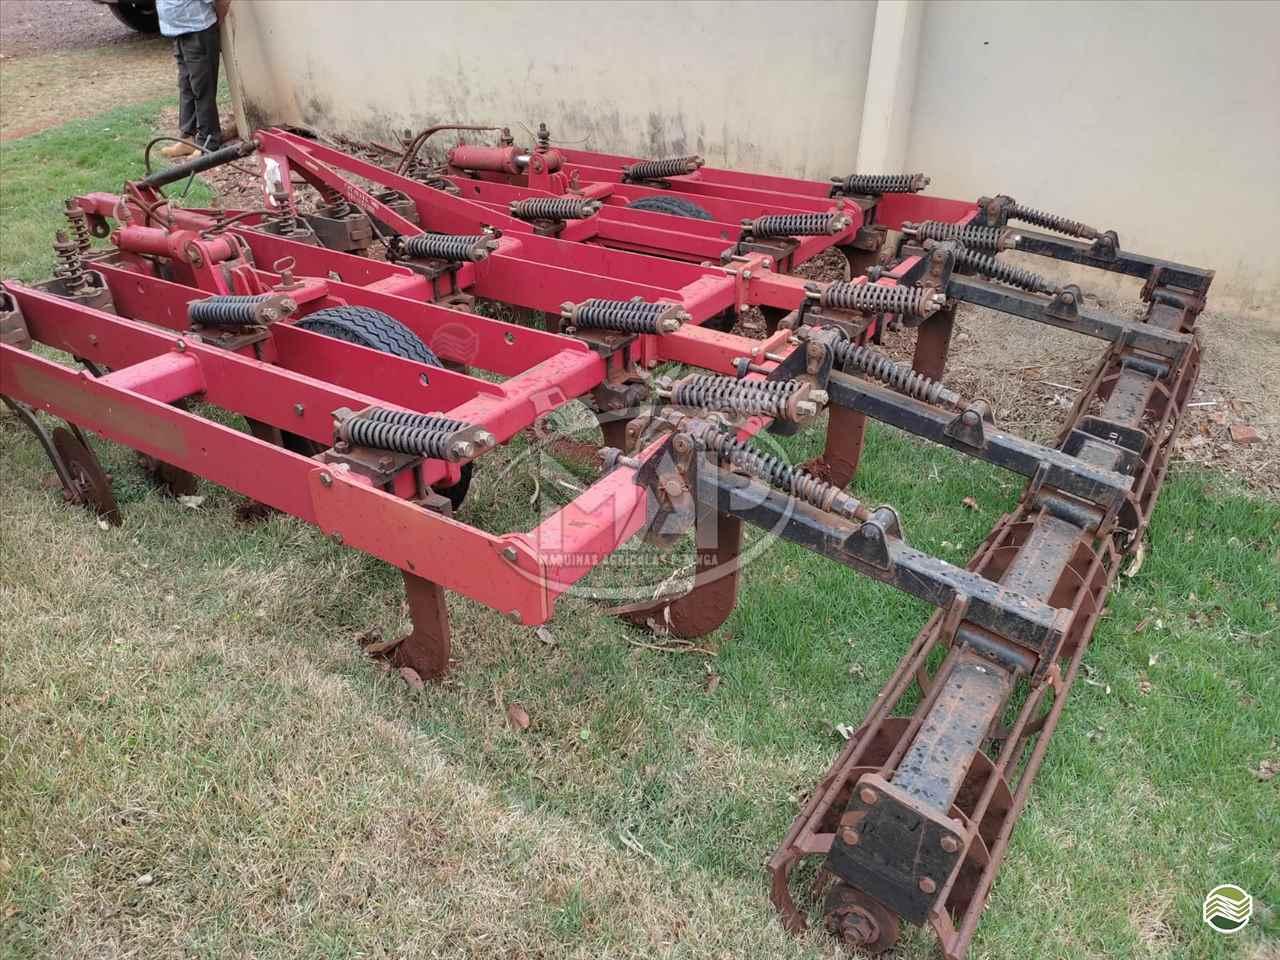 IMPLEMENTOS AGRICOLAS ESCARIFICADOR 11 HASTES DISCO CORTE Máquinas Agrícolas Pitanga PITANGA PARANÁ PR